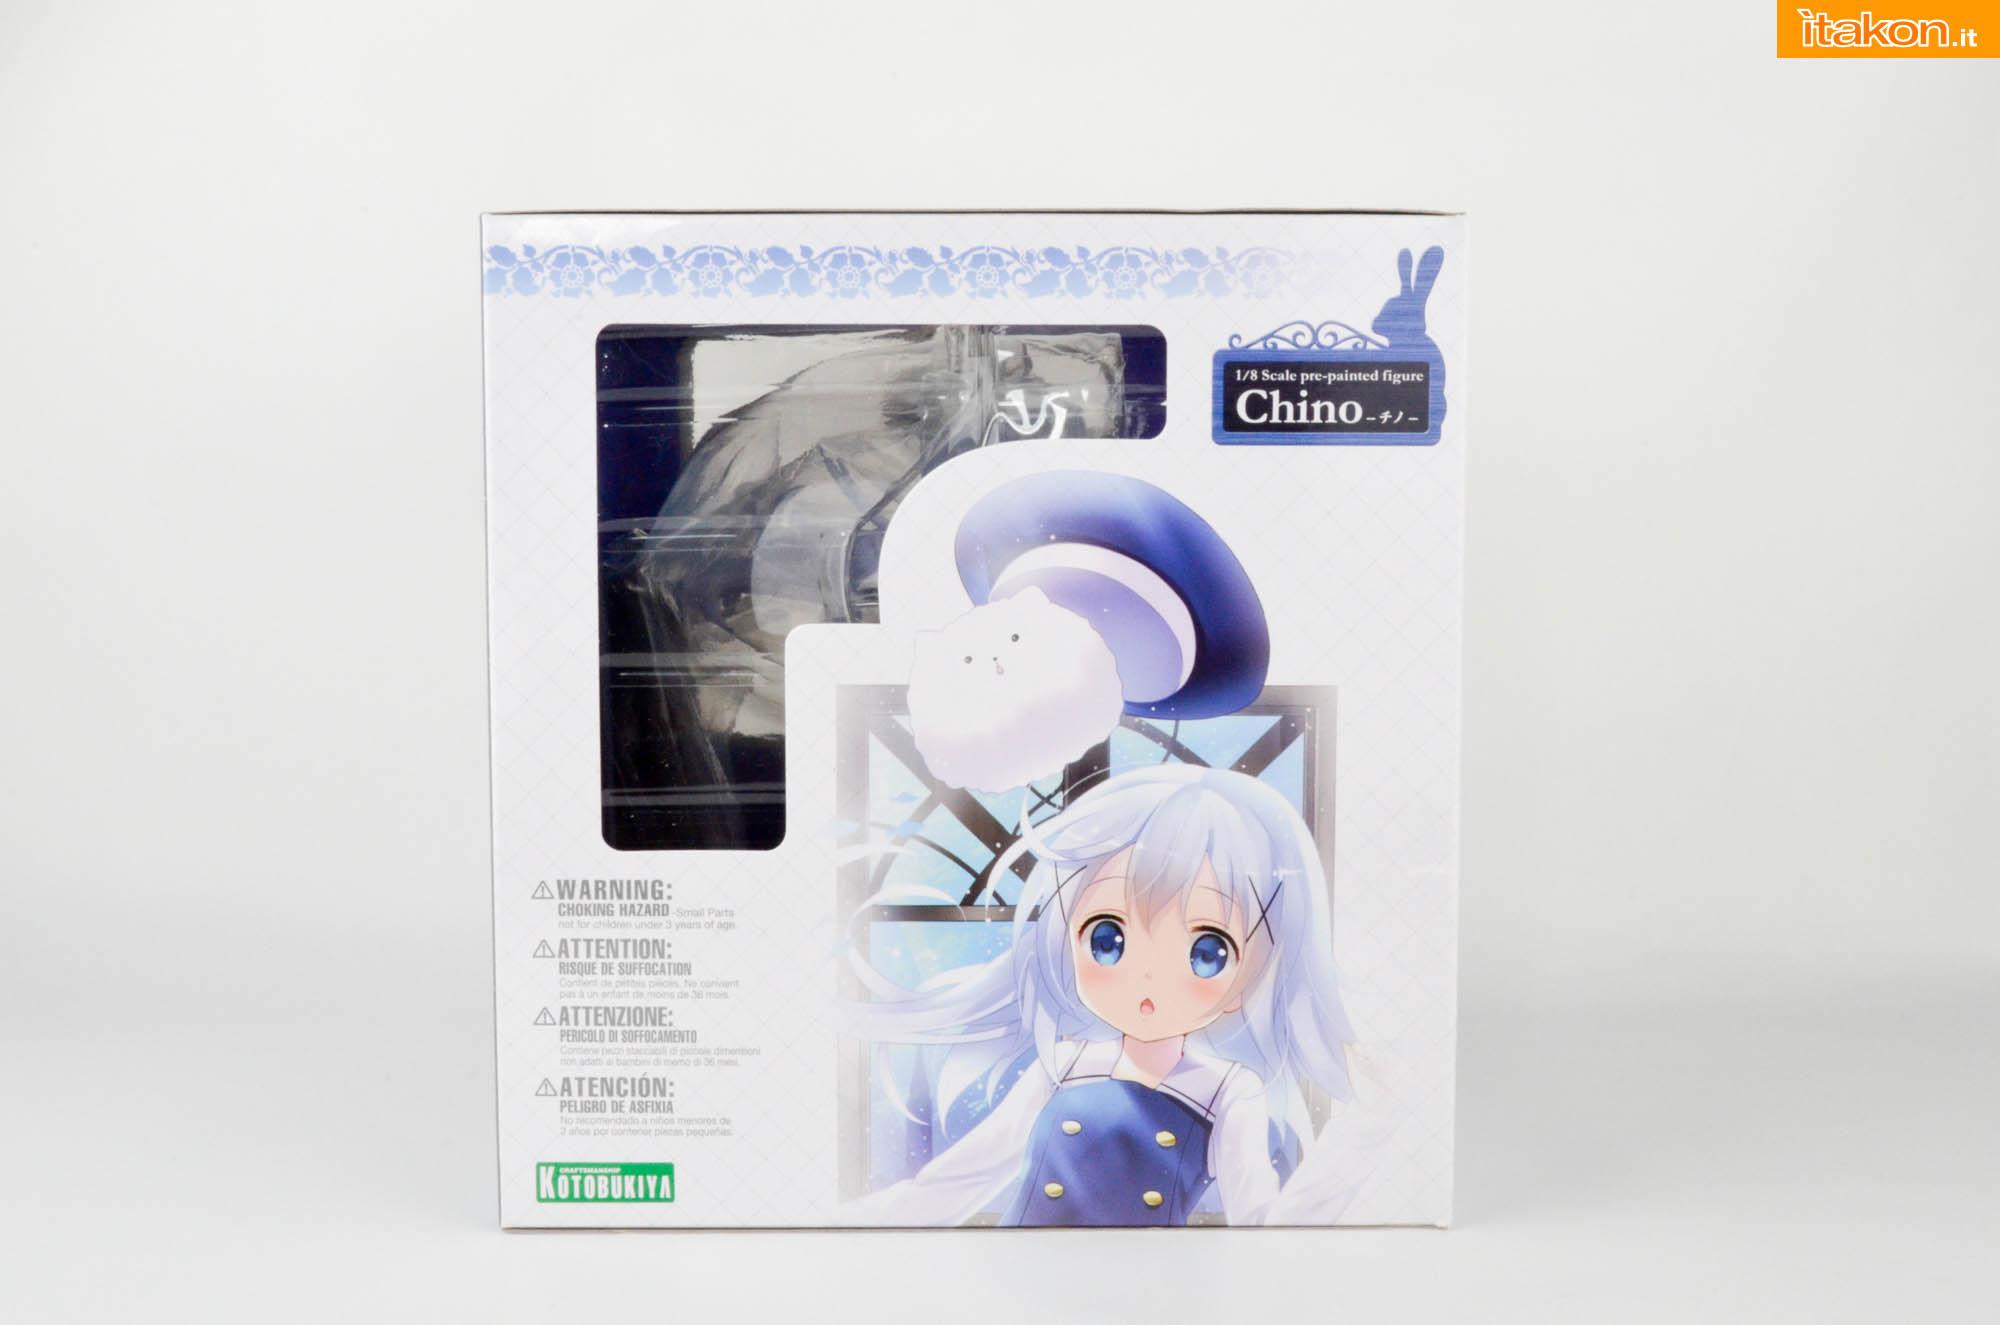 Kotobukiya_Chino_Box-4